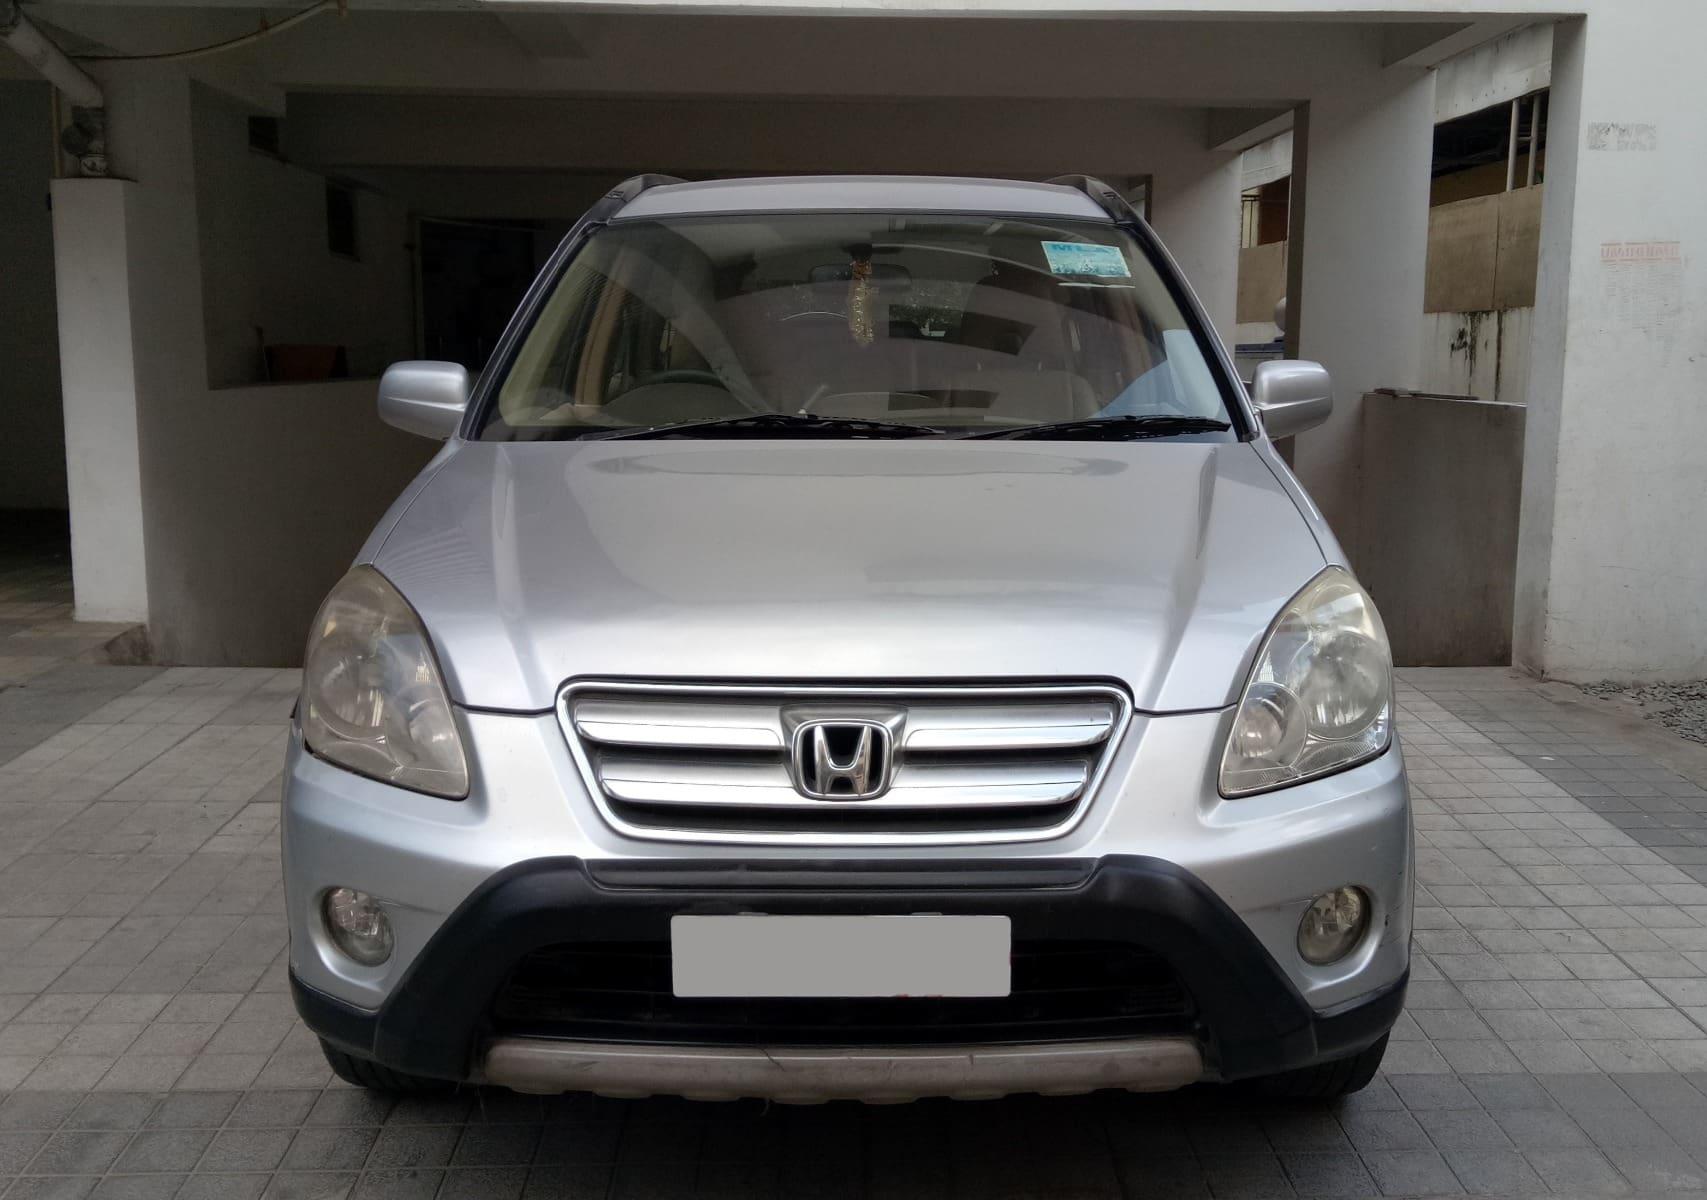 Honda CR-V 2.4L 4WD AT